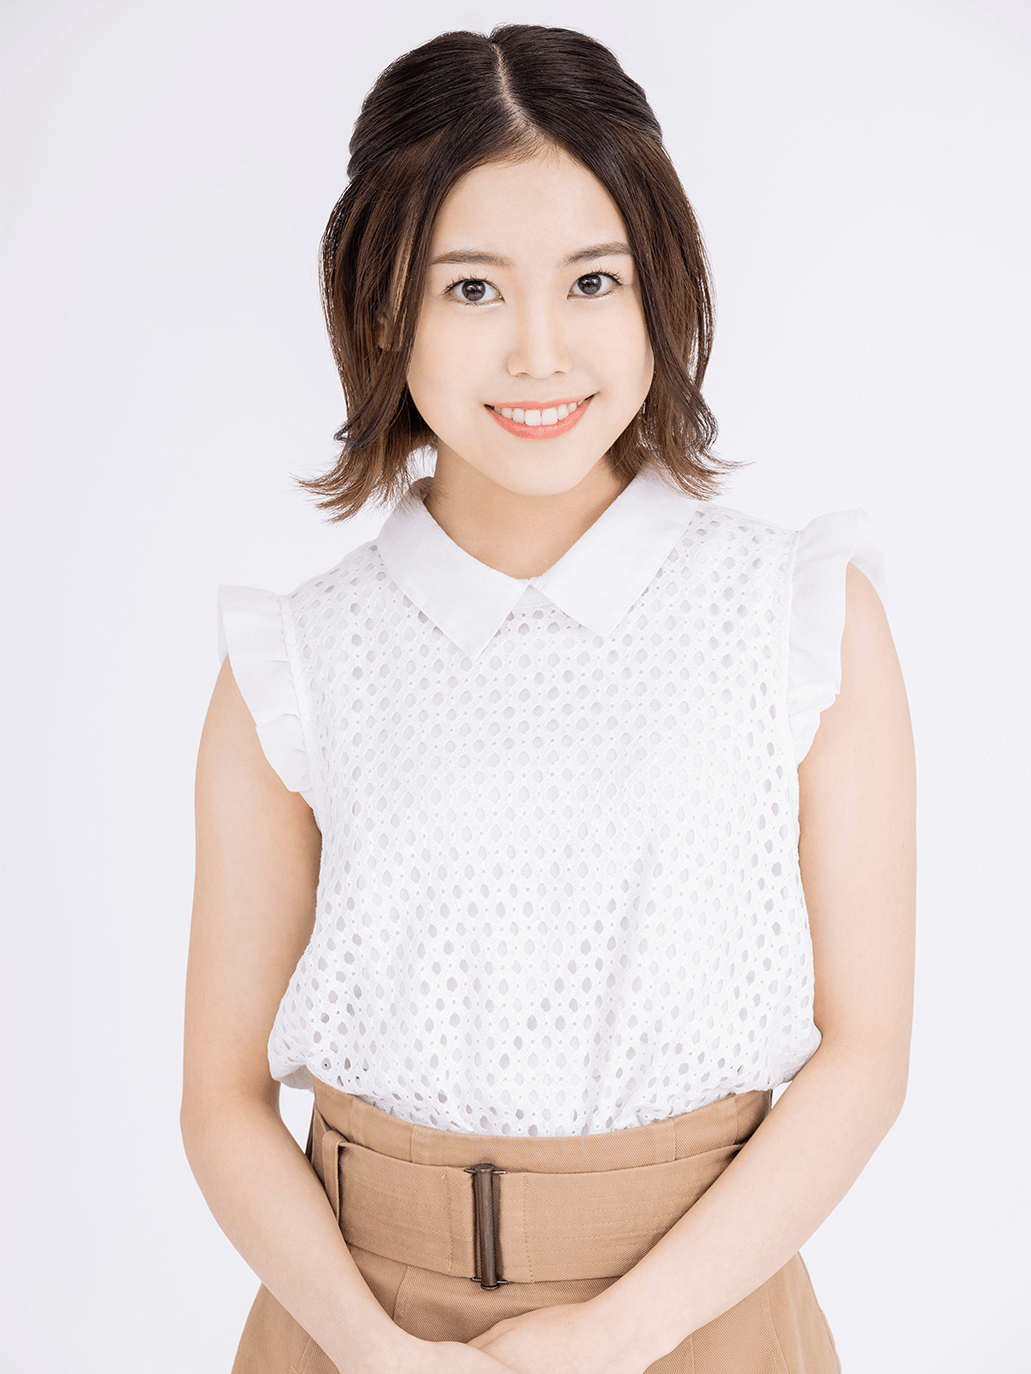 Rin Tateishi